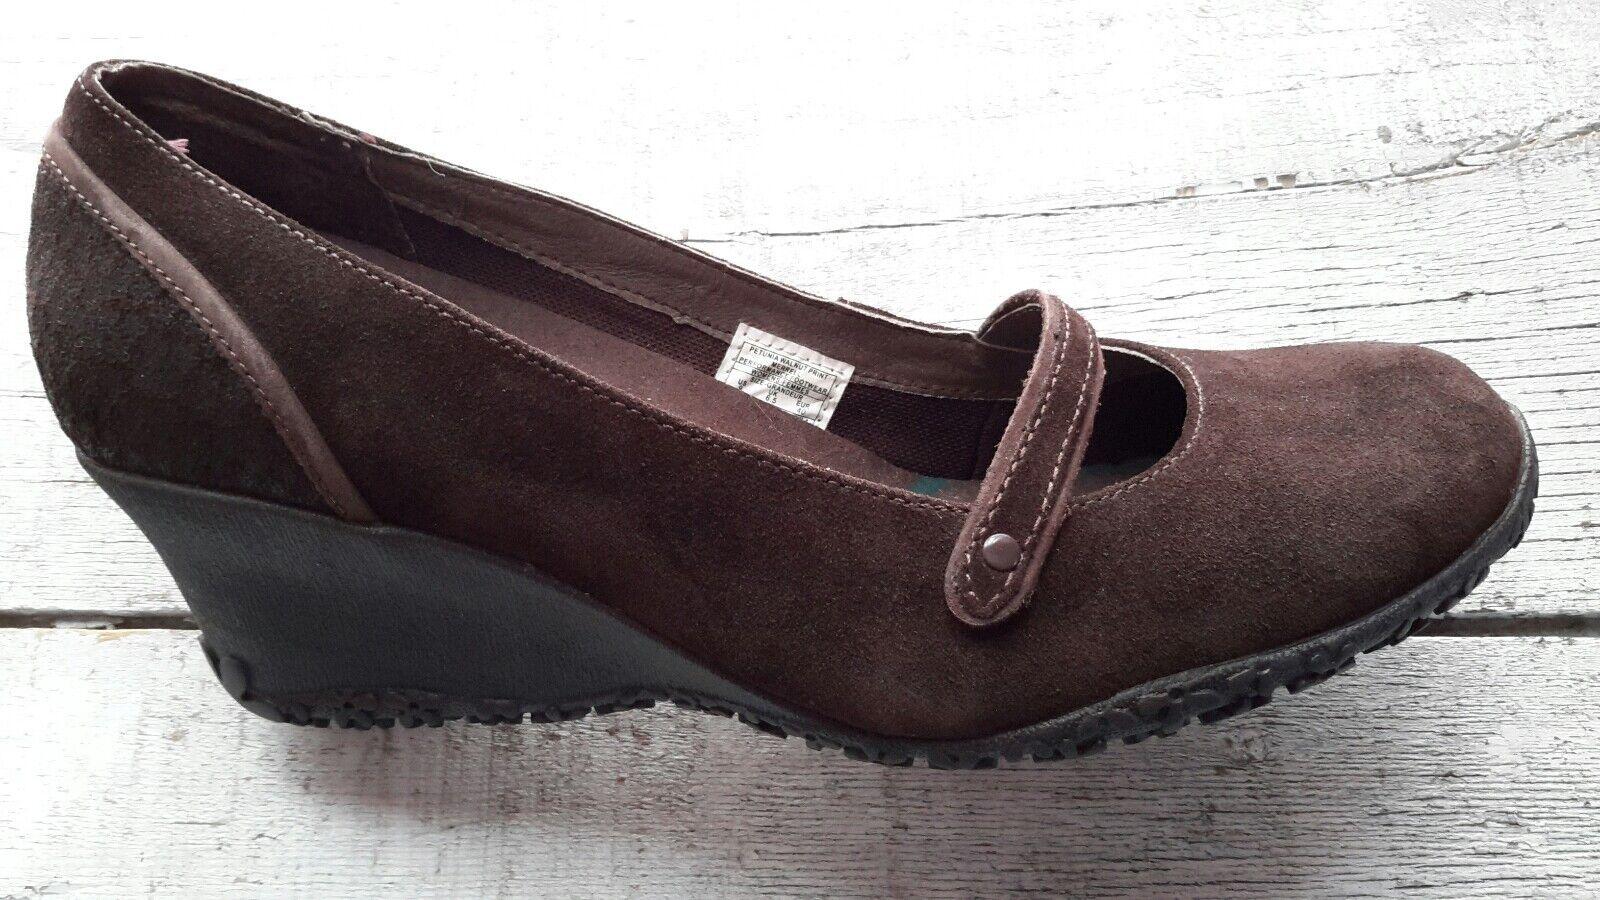 Merrell Petunia Chaussures Mary Jane Compensé En Daim Marron À Enfiler Vibram Chaussures Taille 9